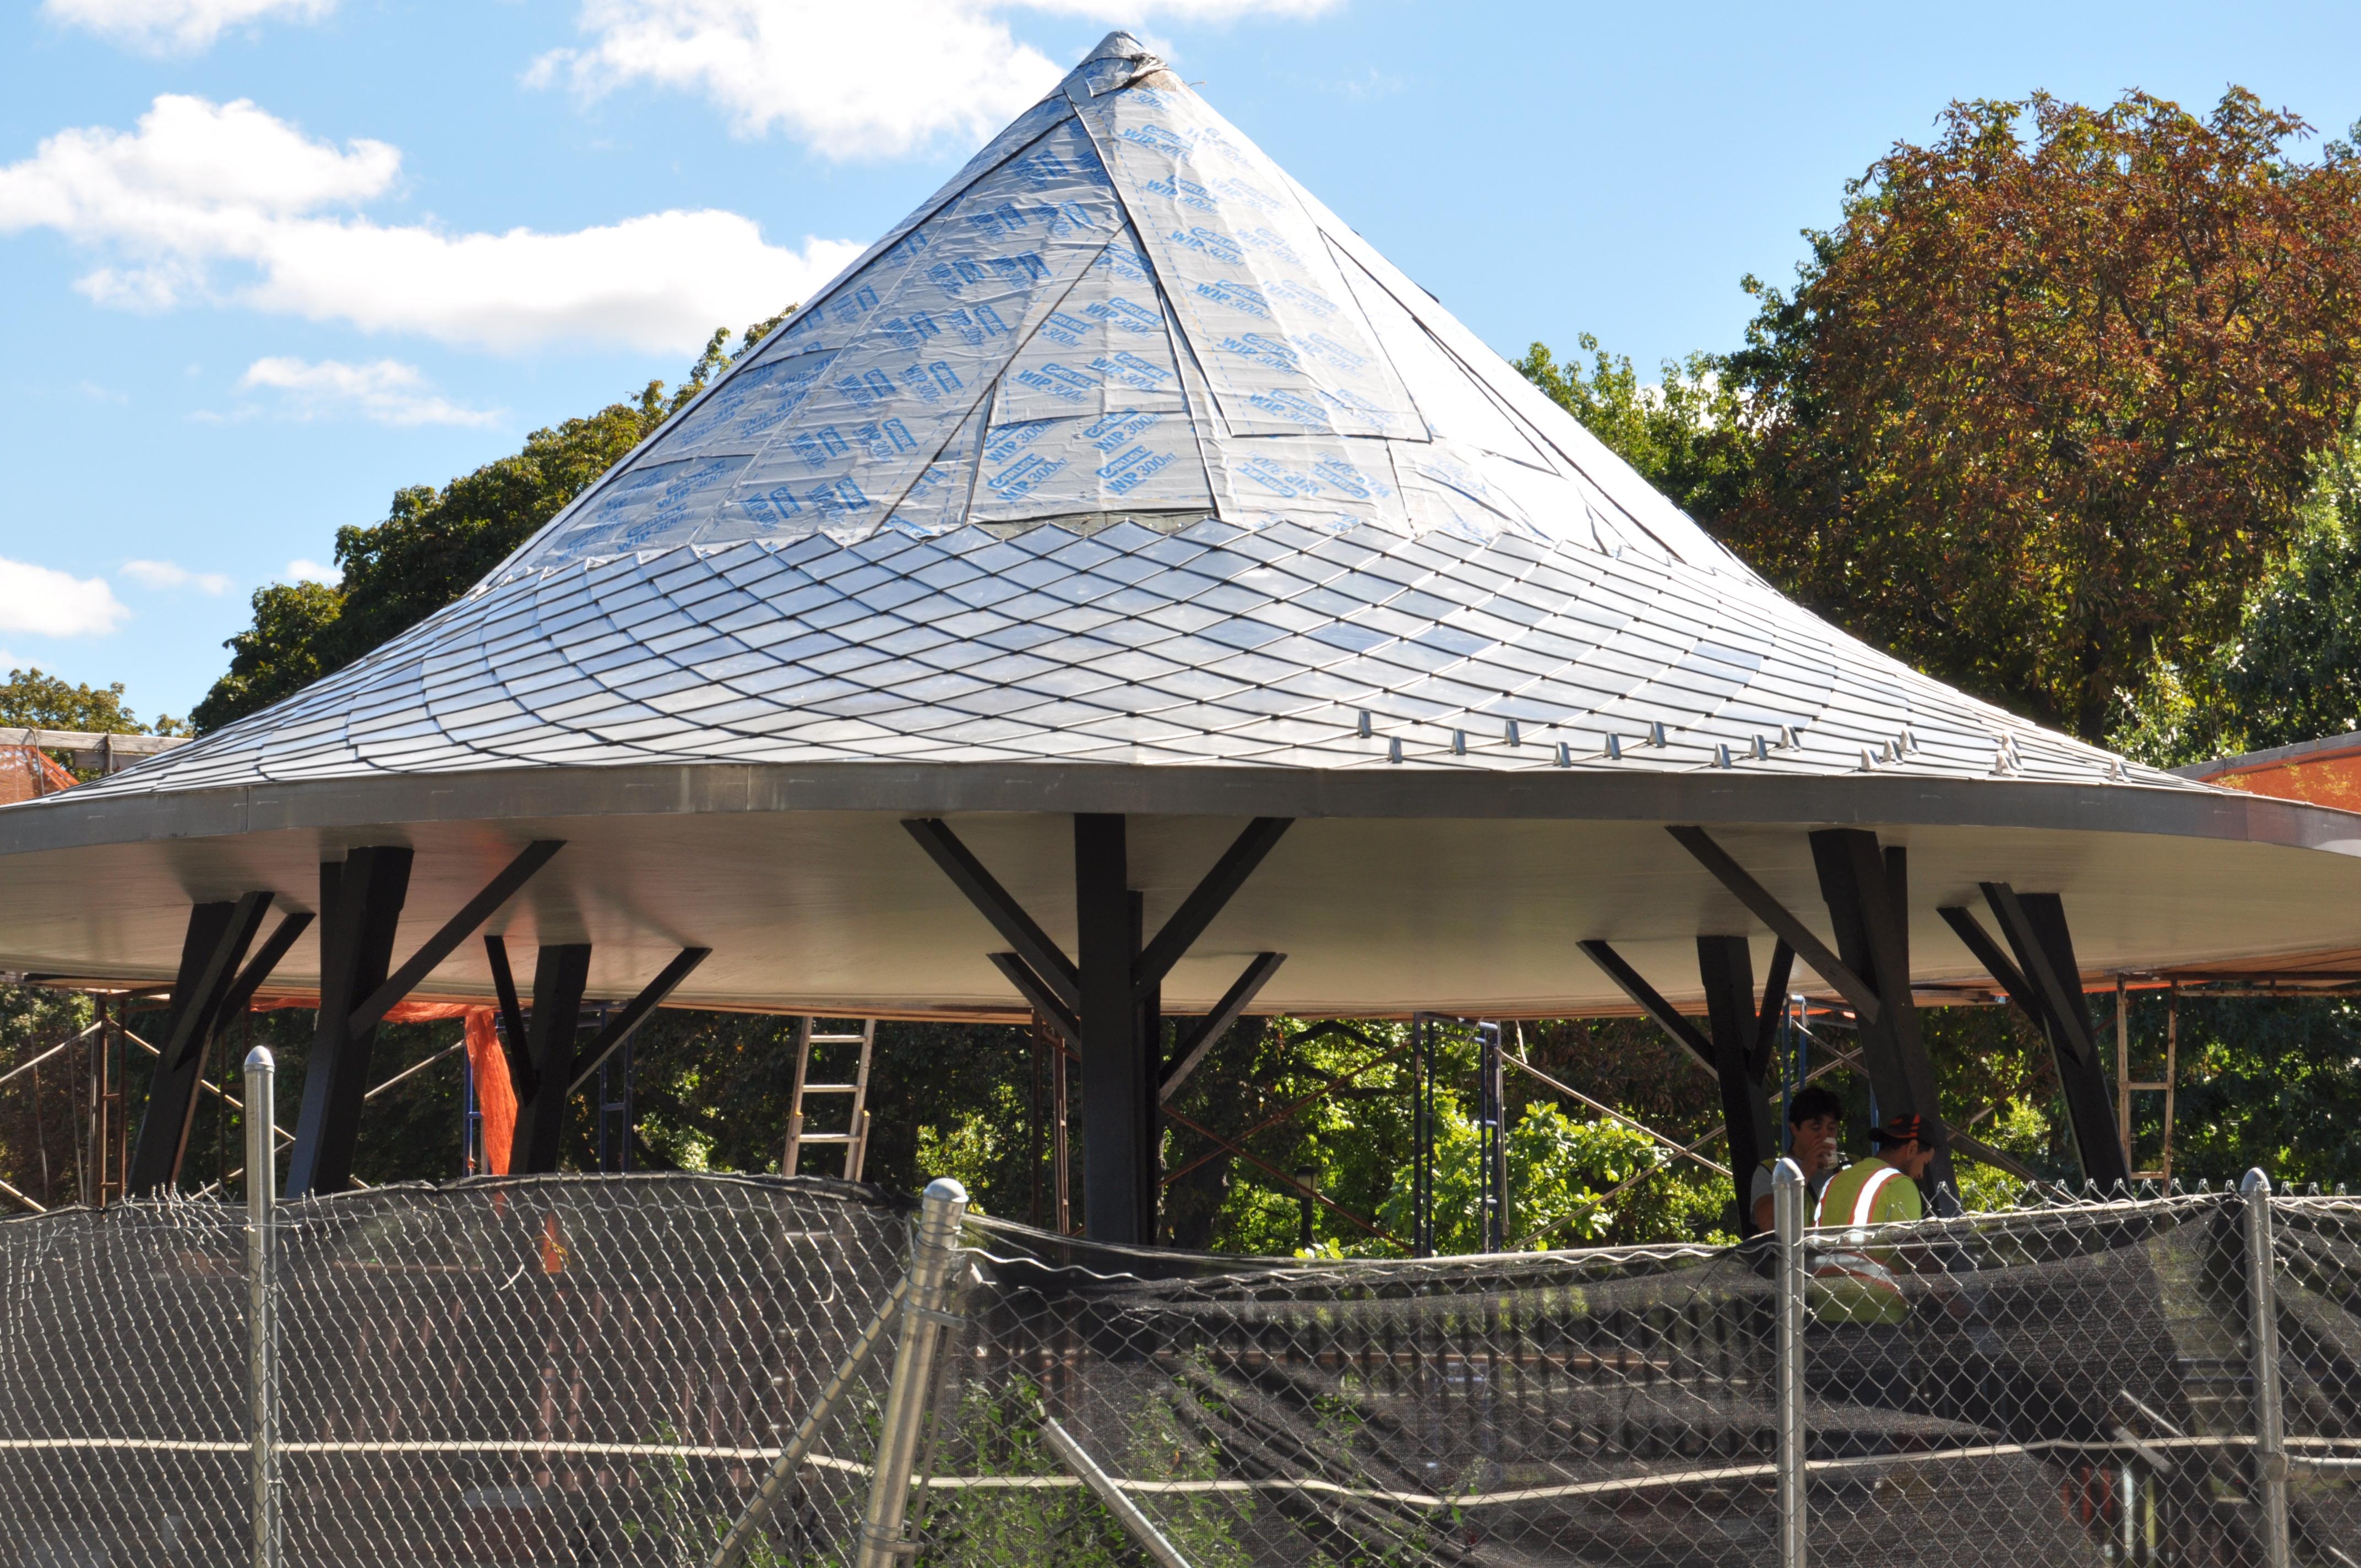 terne shingle turret construction